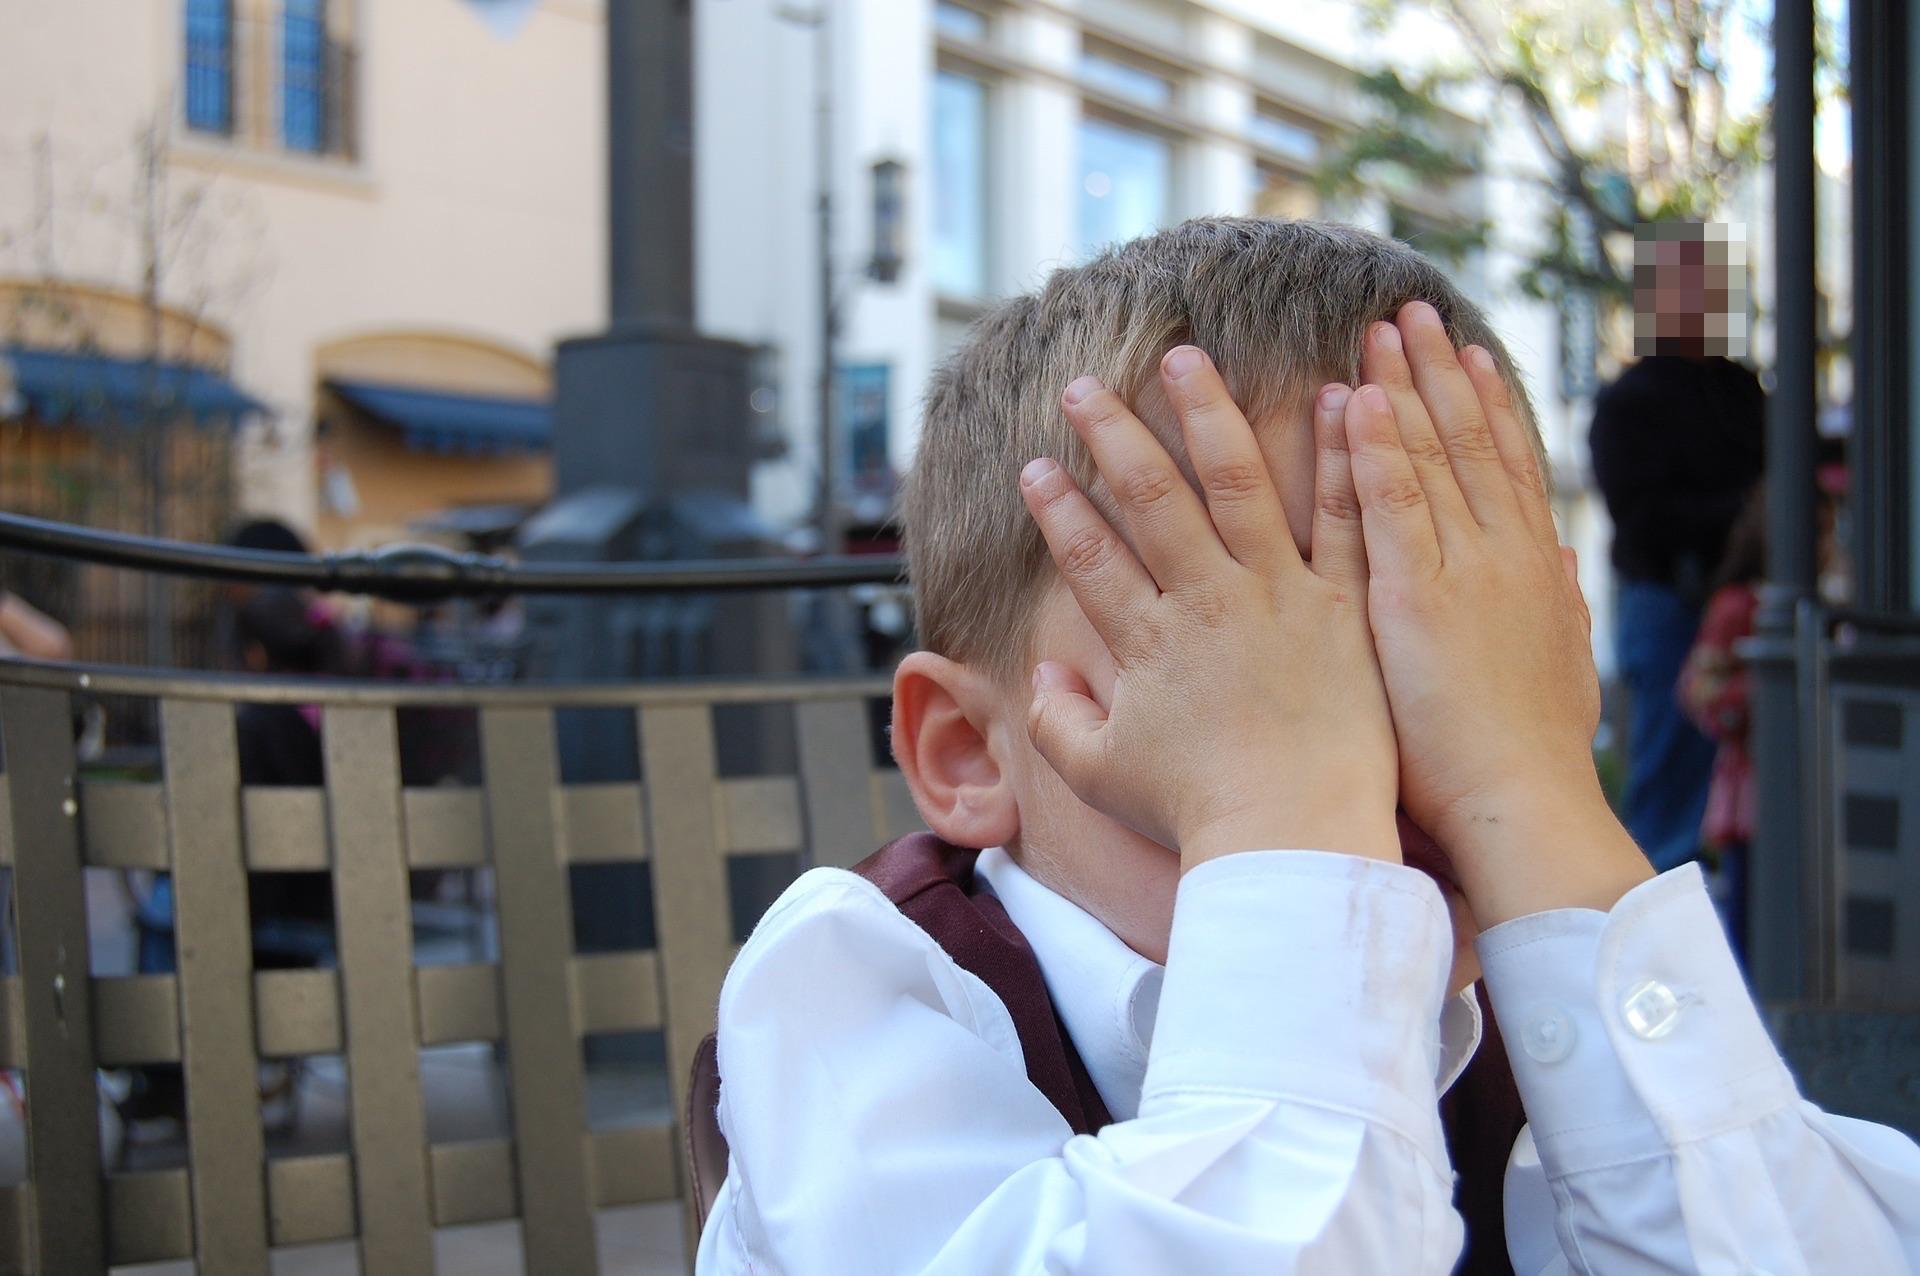 Boy hiding behind hands